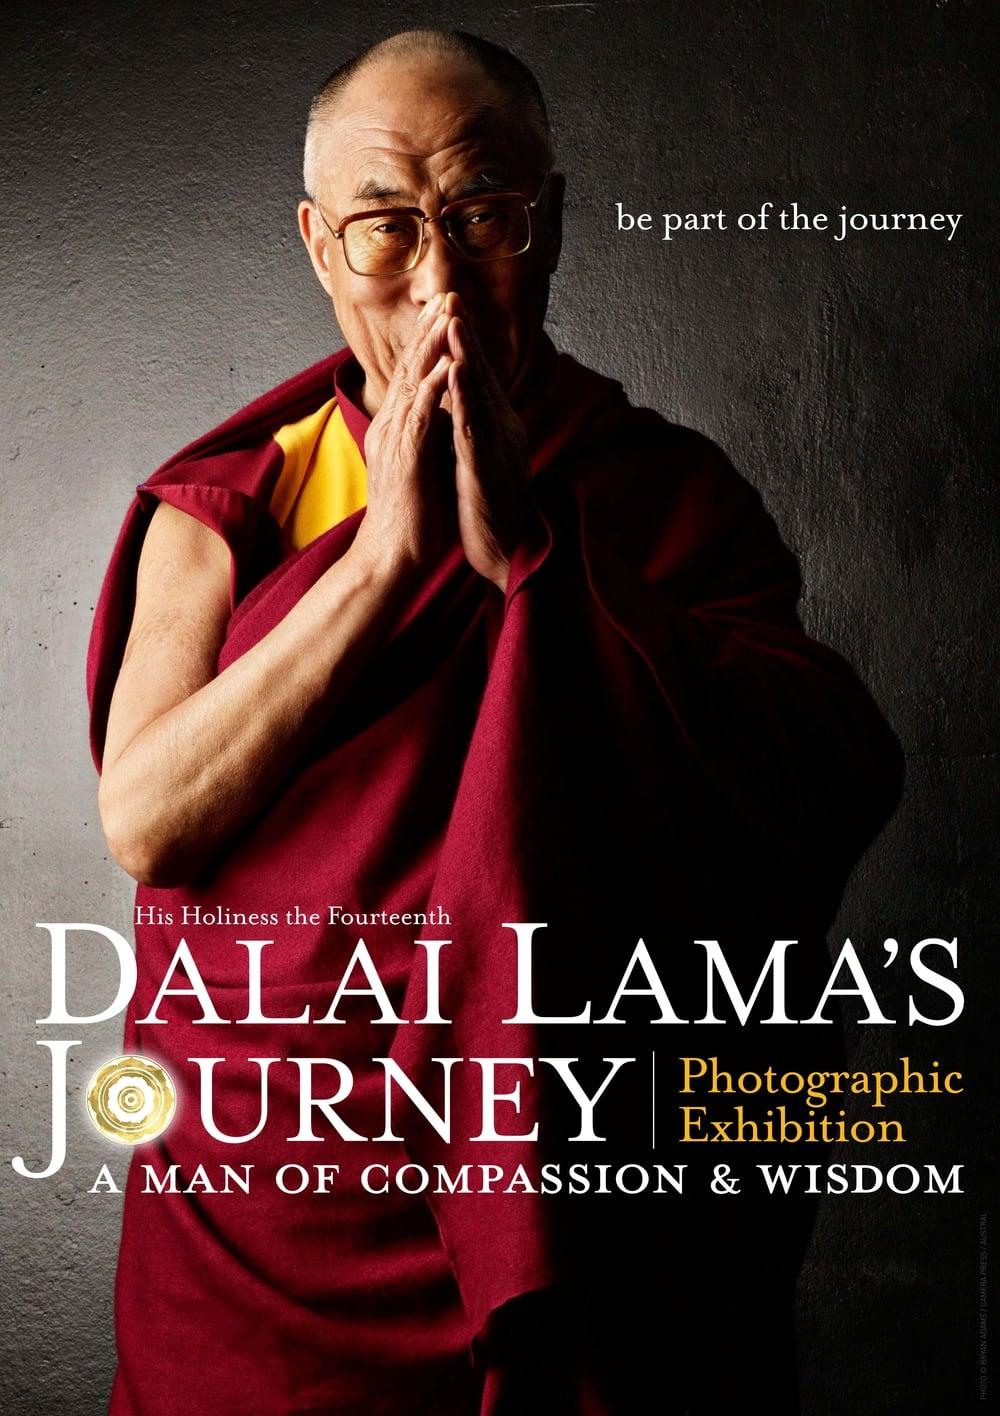 The Dalai Lama's Journey Photographic Exhibition, 2011